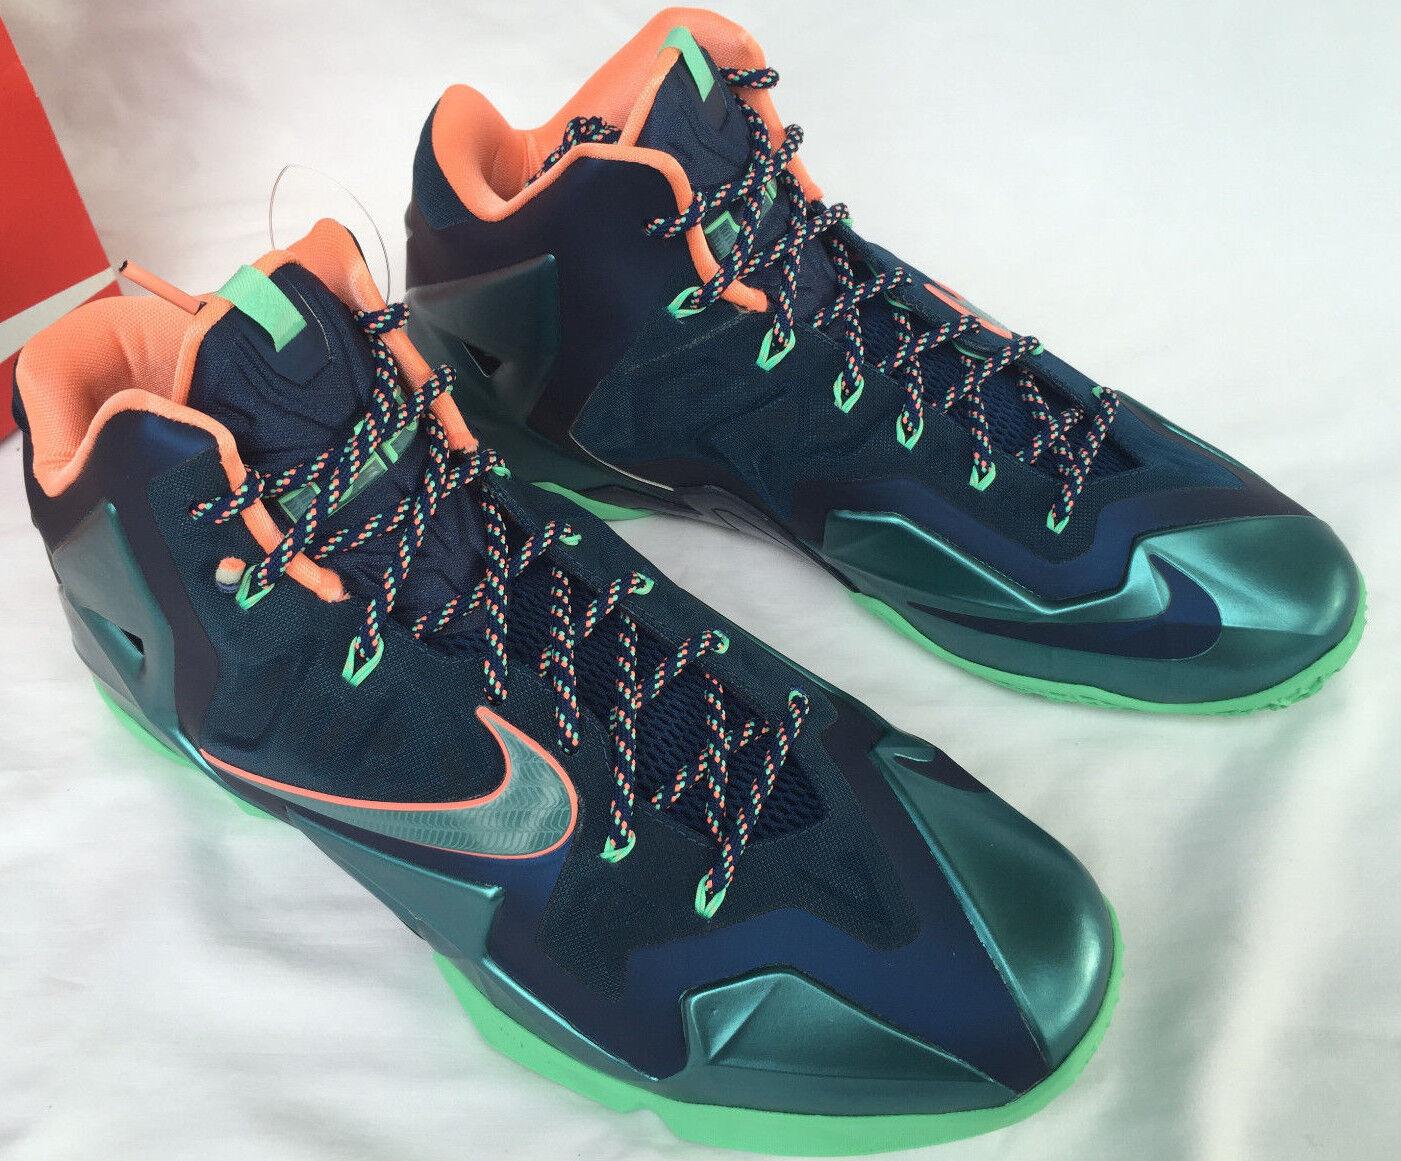 Nike lebron xi 11 akron / miami 616175-400 scarpe da basket maschile di james nuova